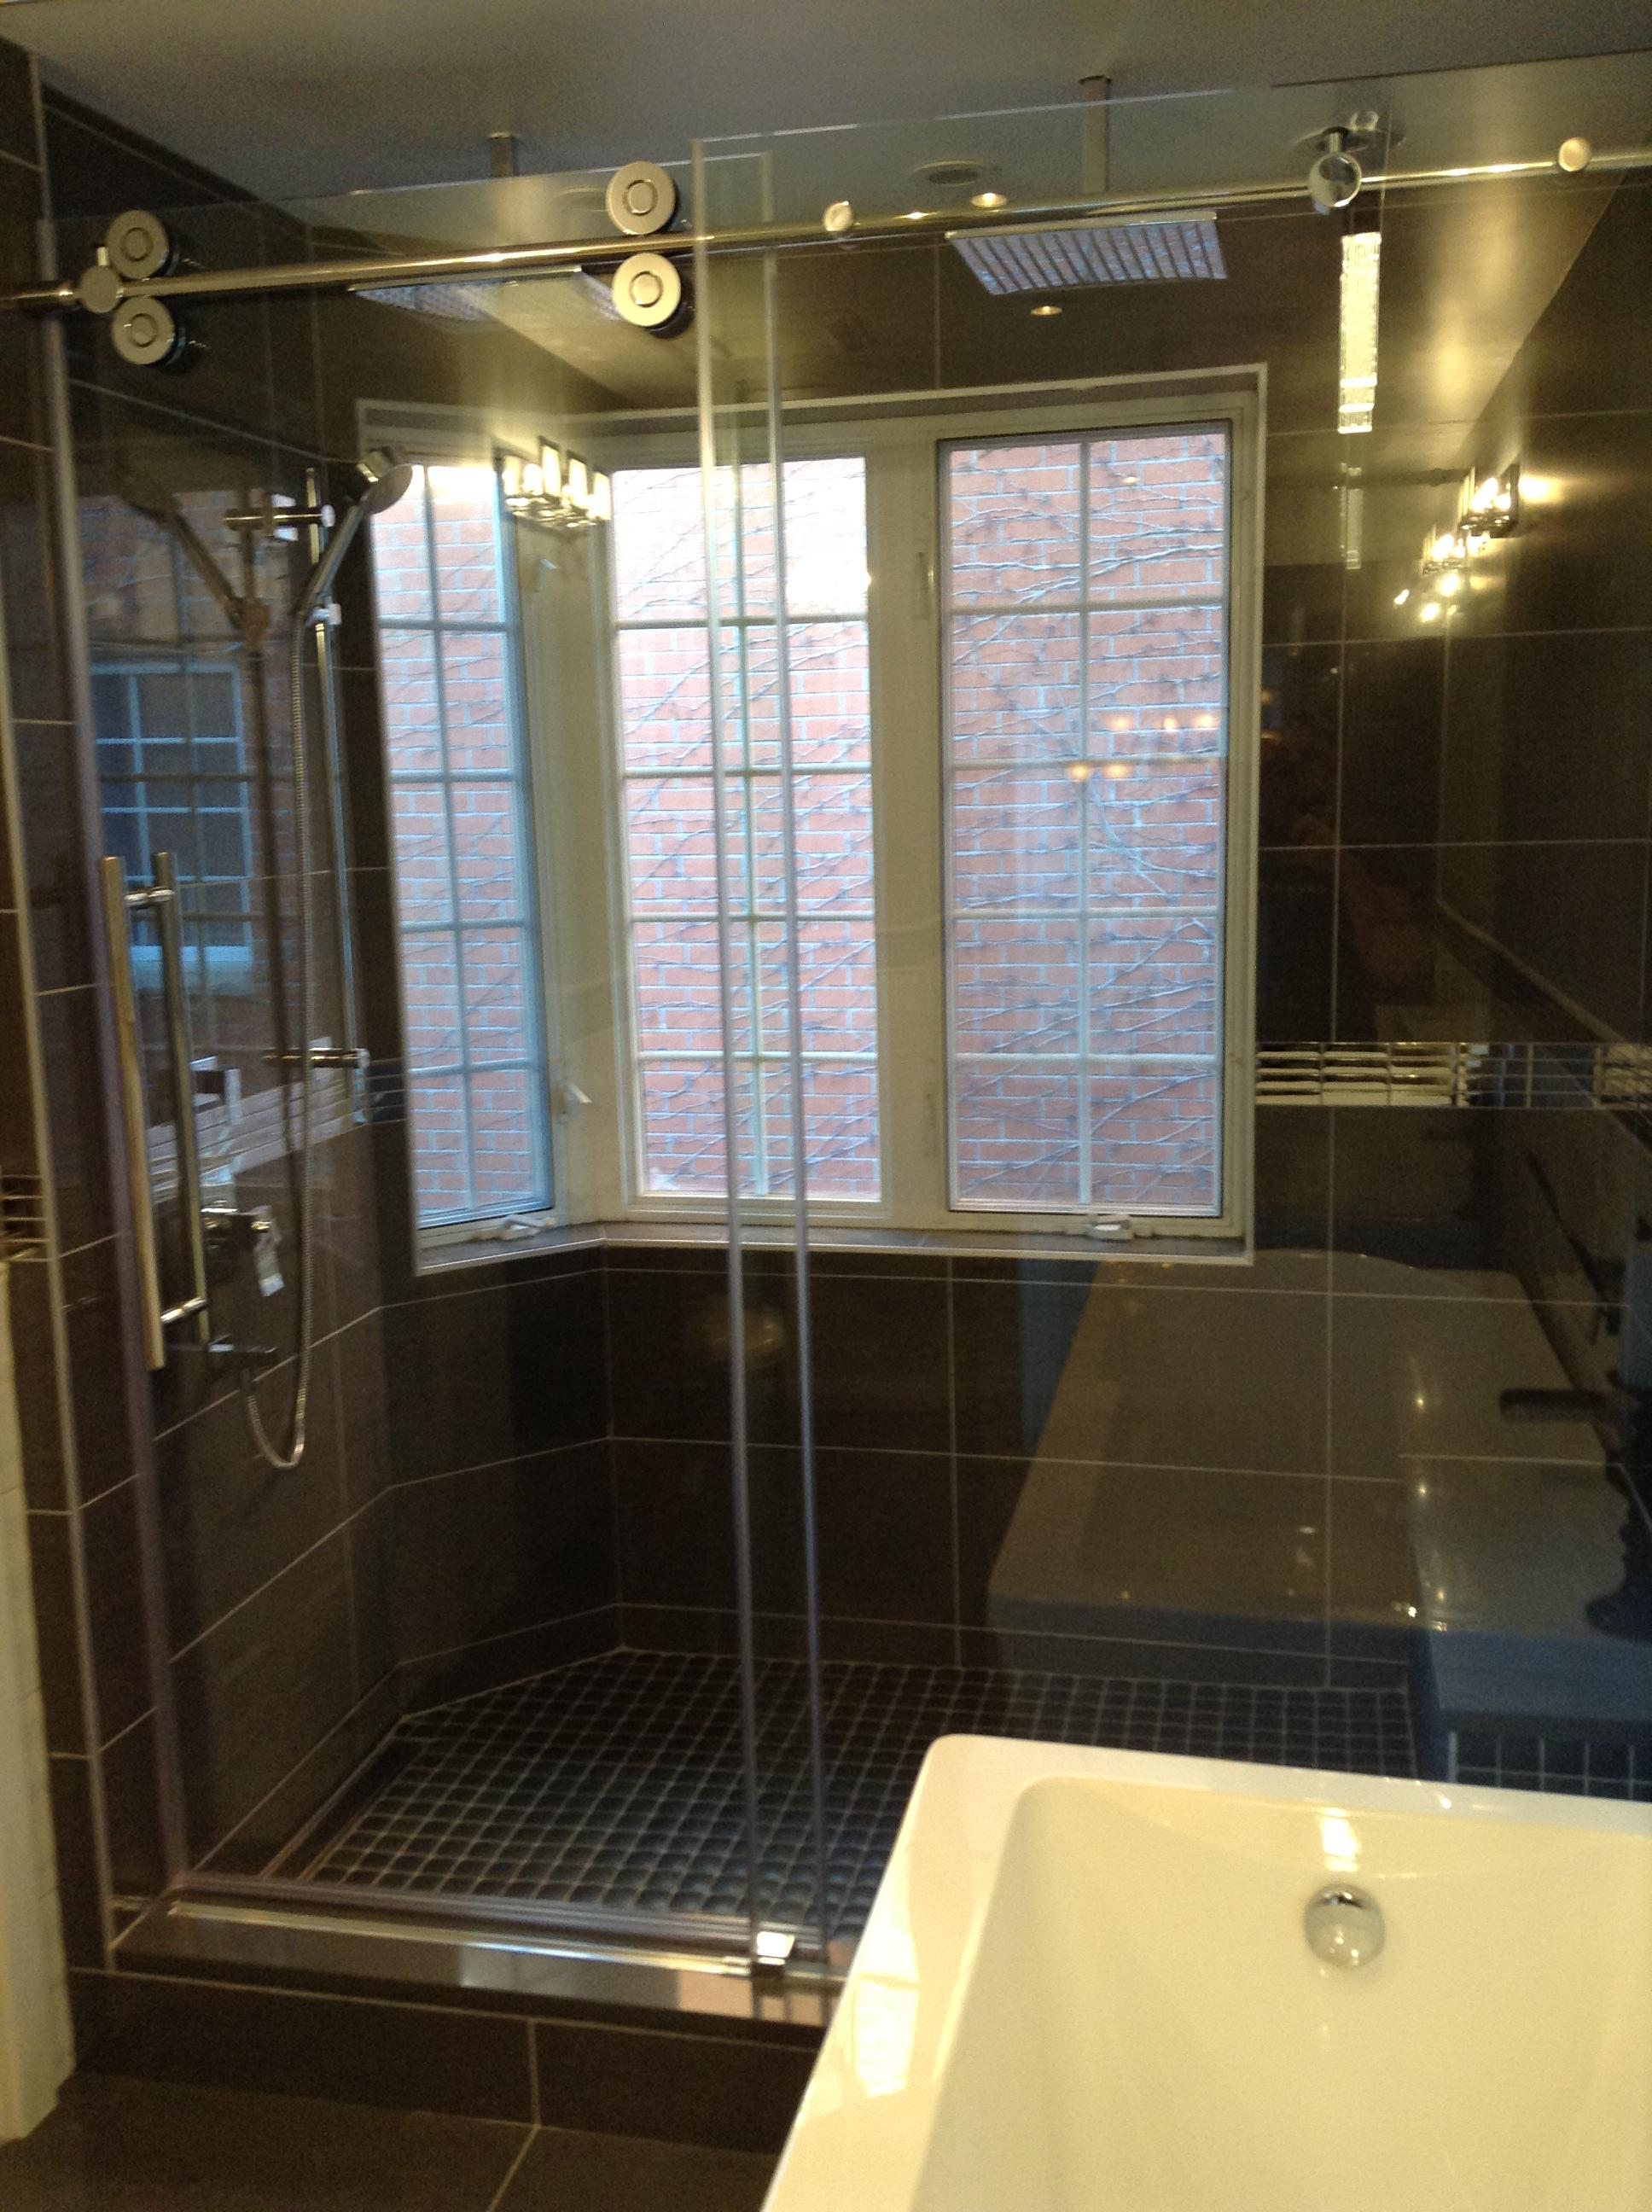 Cavallino Construction : Renovation, Carpentry, Tiling, Walls and ...